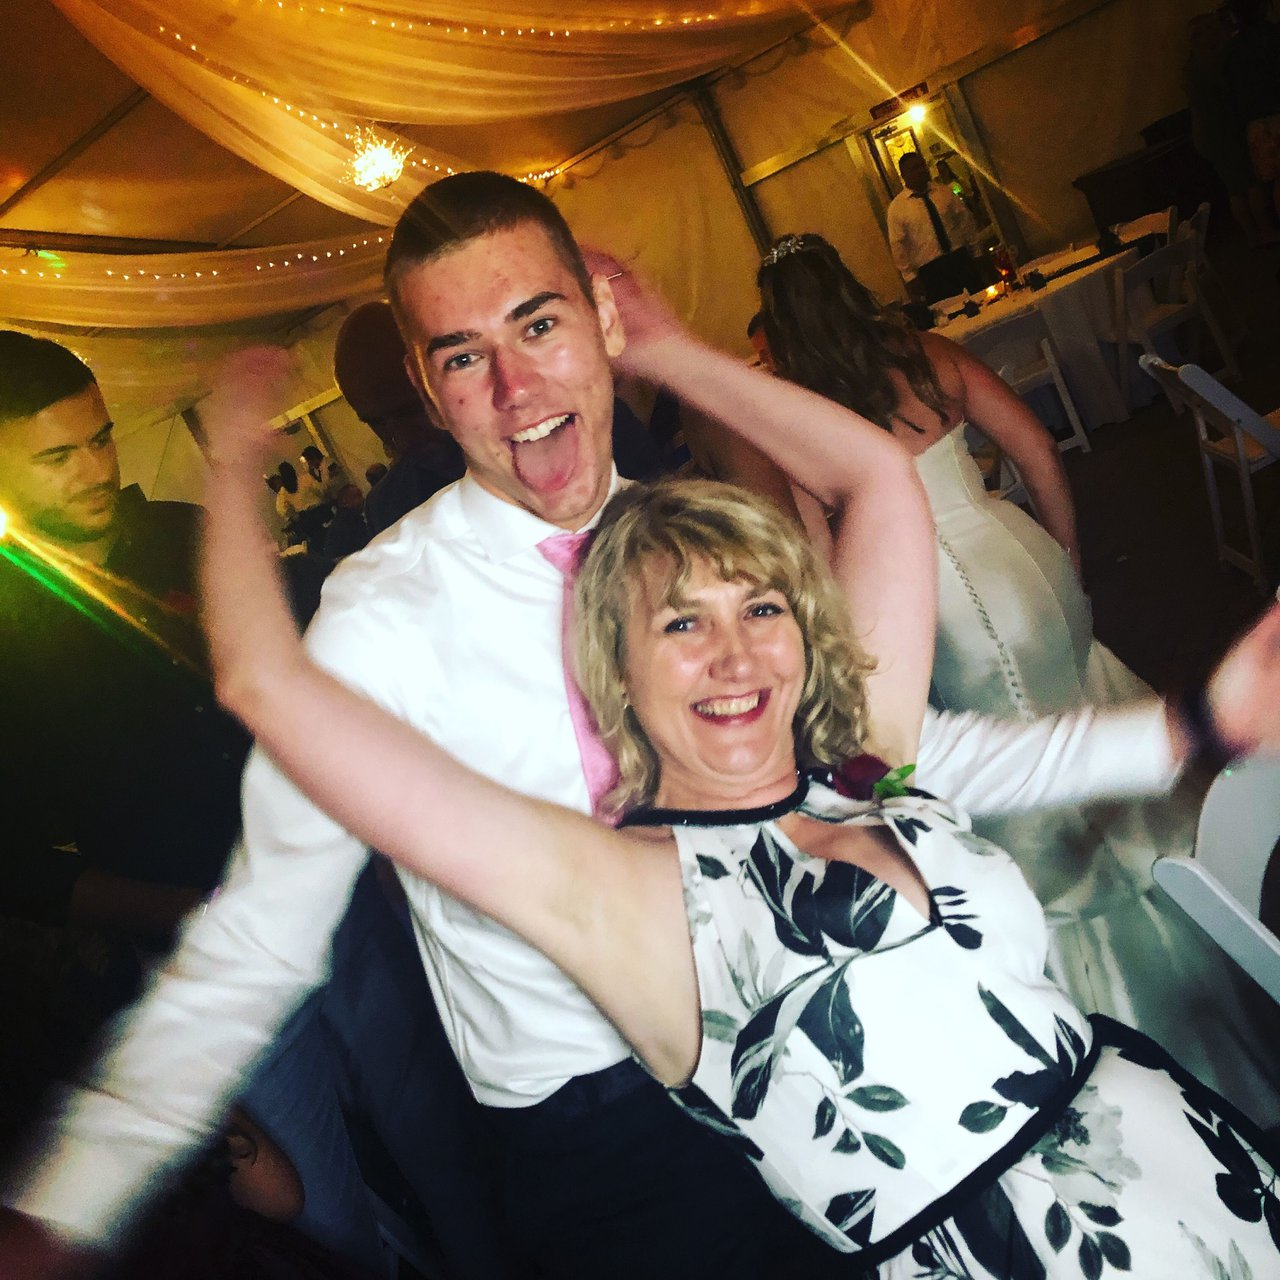 Leyjla and John Wedding—#LCJB2019 photo 20072E25-A582-4A80-A3B4-E86162635484.jpg